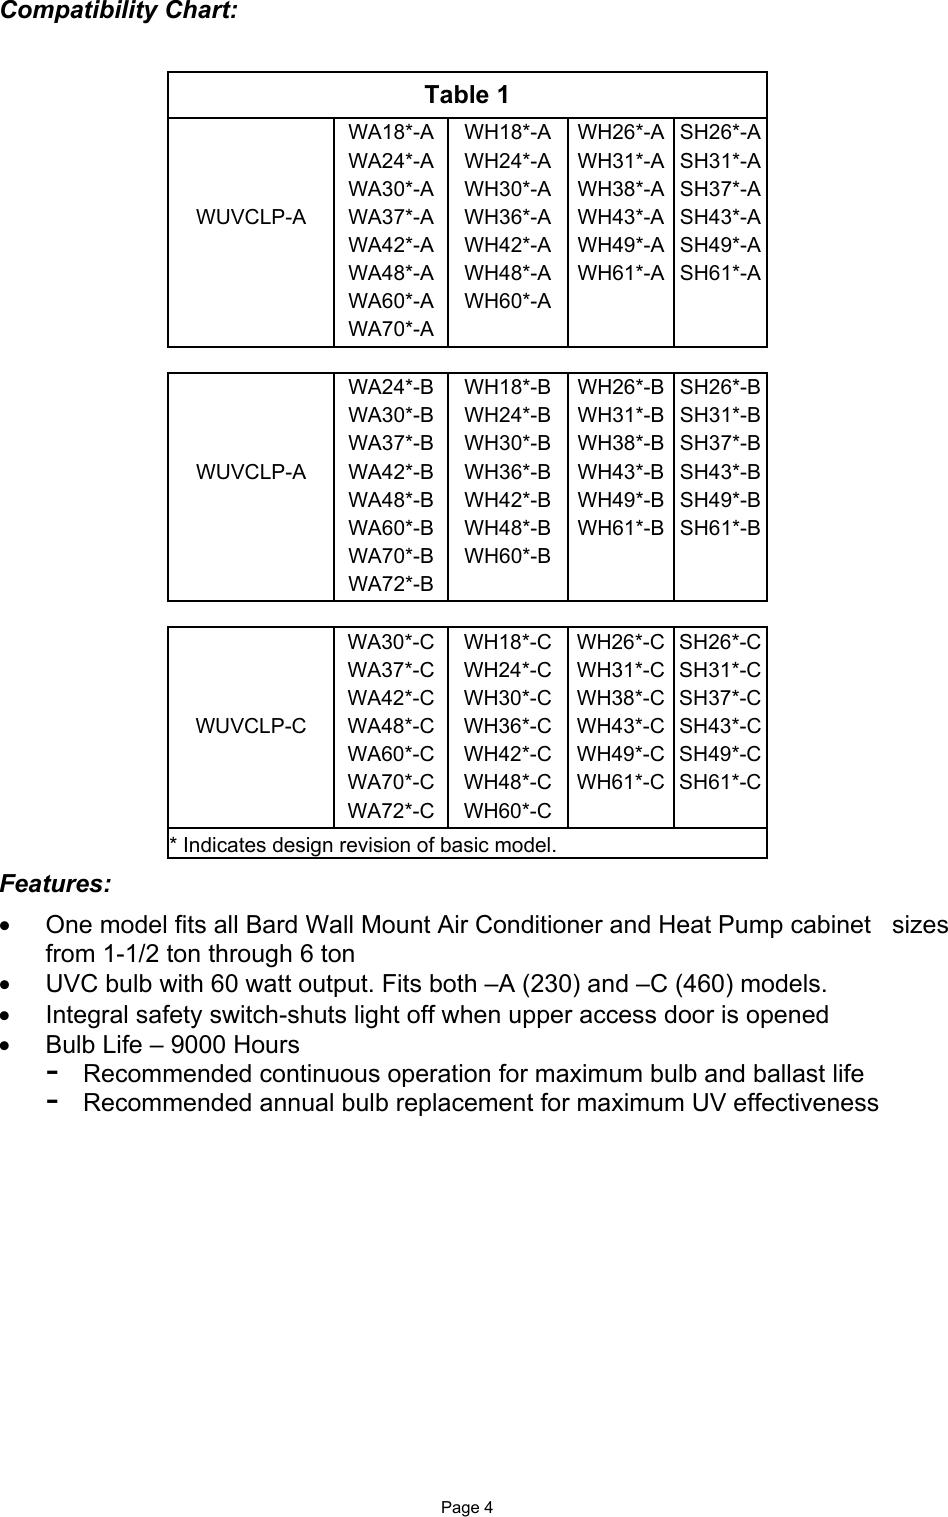 Bard WUVCLP C 46441700 UV B Inst Sheet Rev A 10 03 User